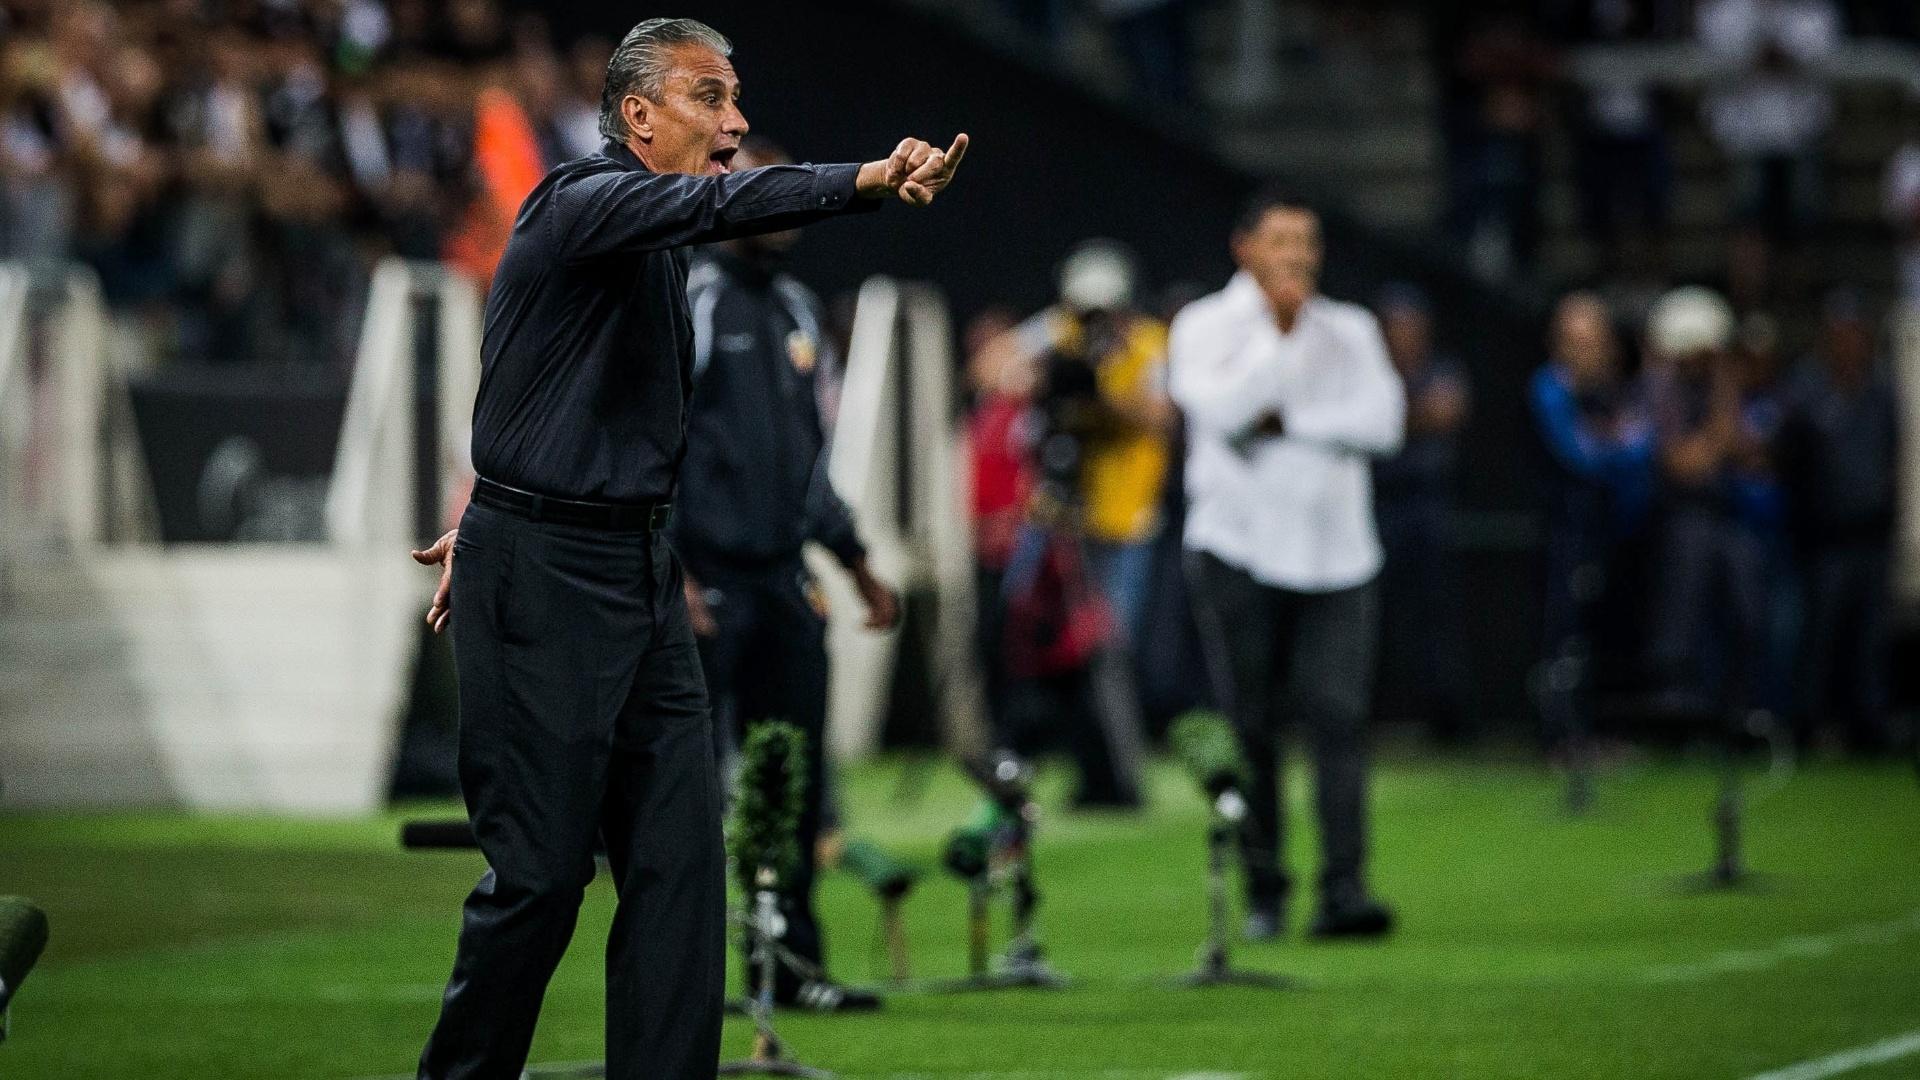 Tite orienta os jogadores do Corinthians durante a vitória sobre o Danubio, na Libertadores